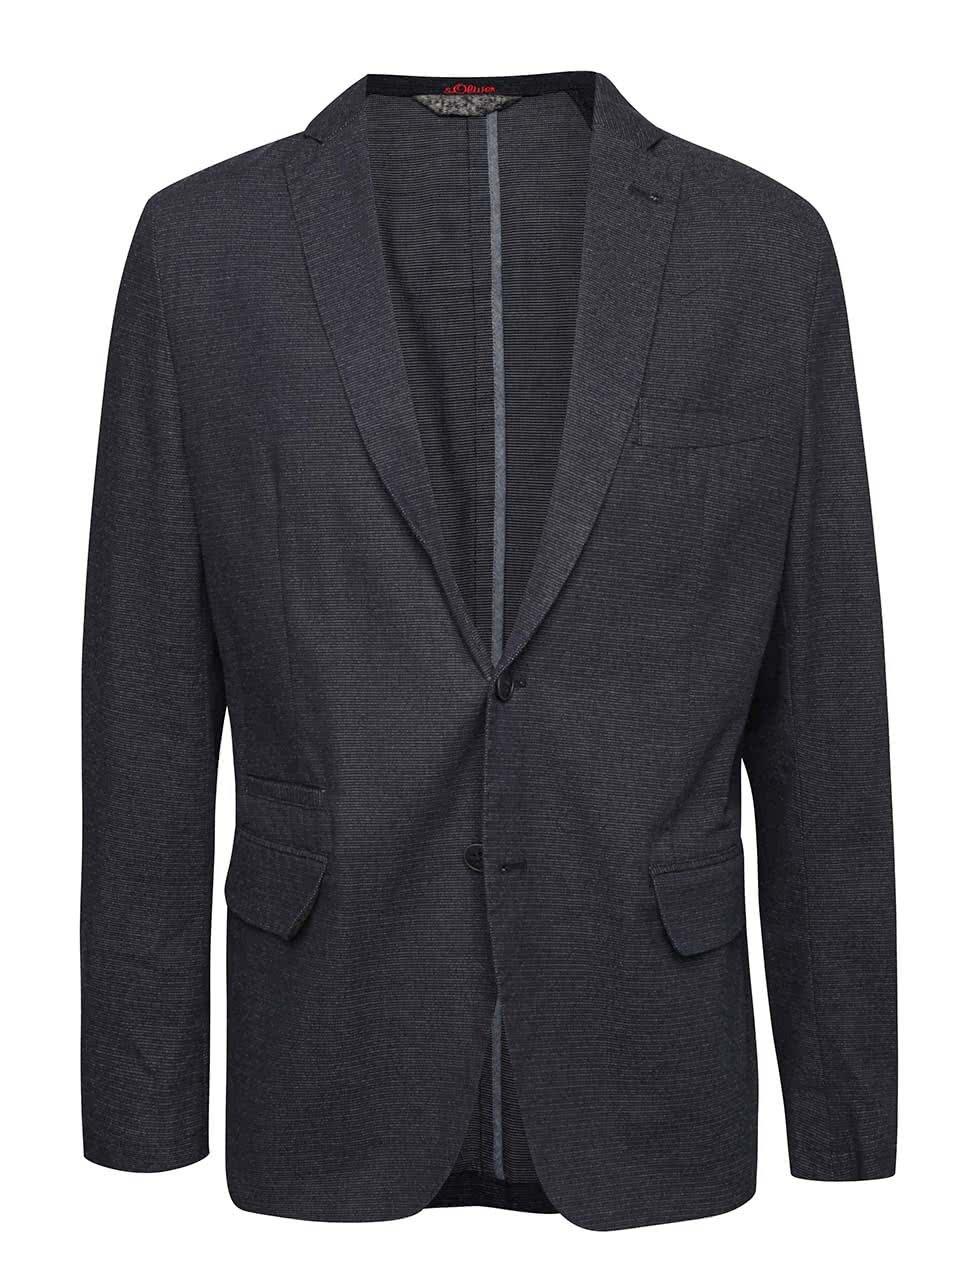 Tmavě modrý pánský blejzr sako s.Oliver